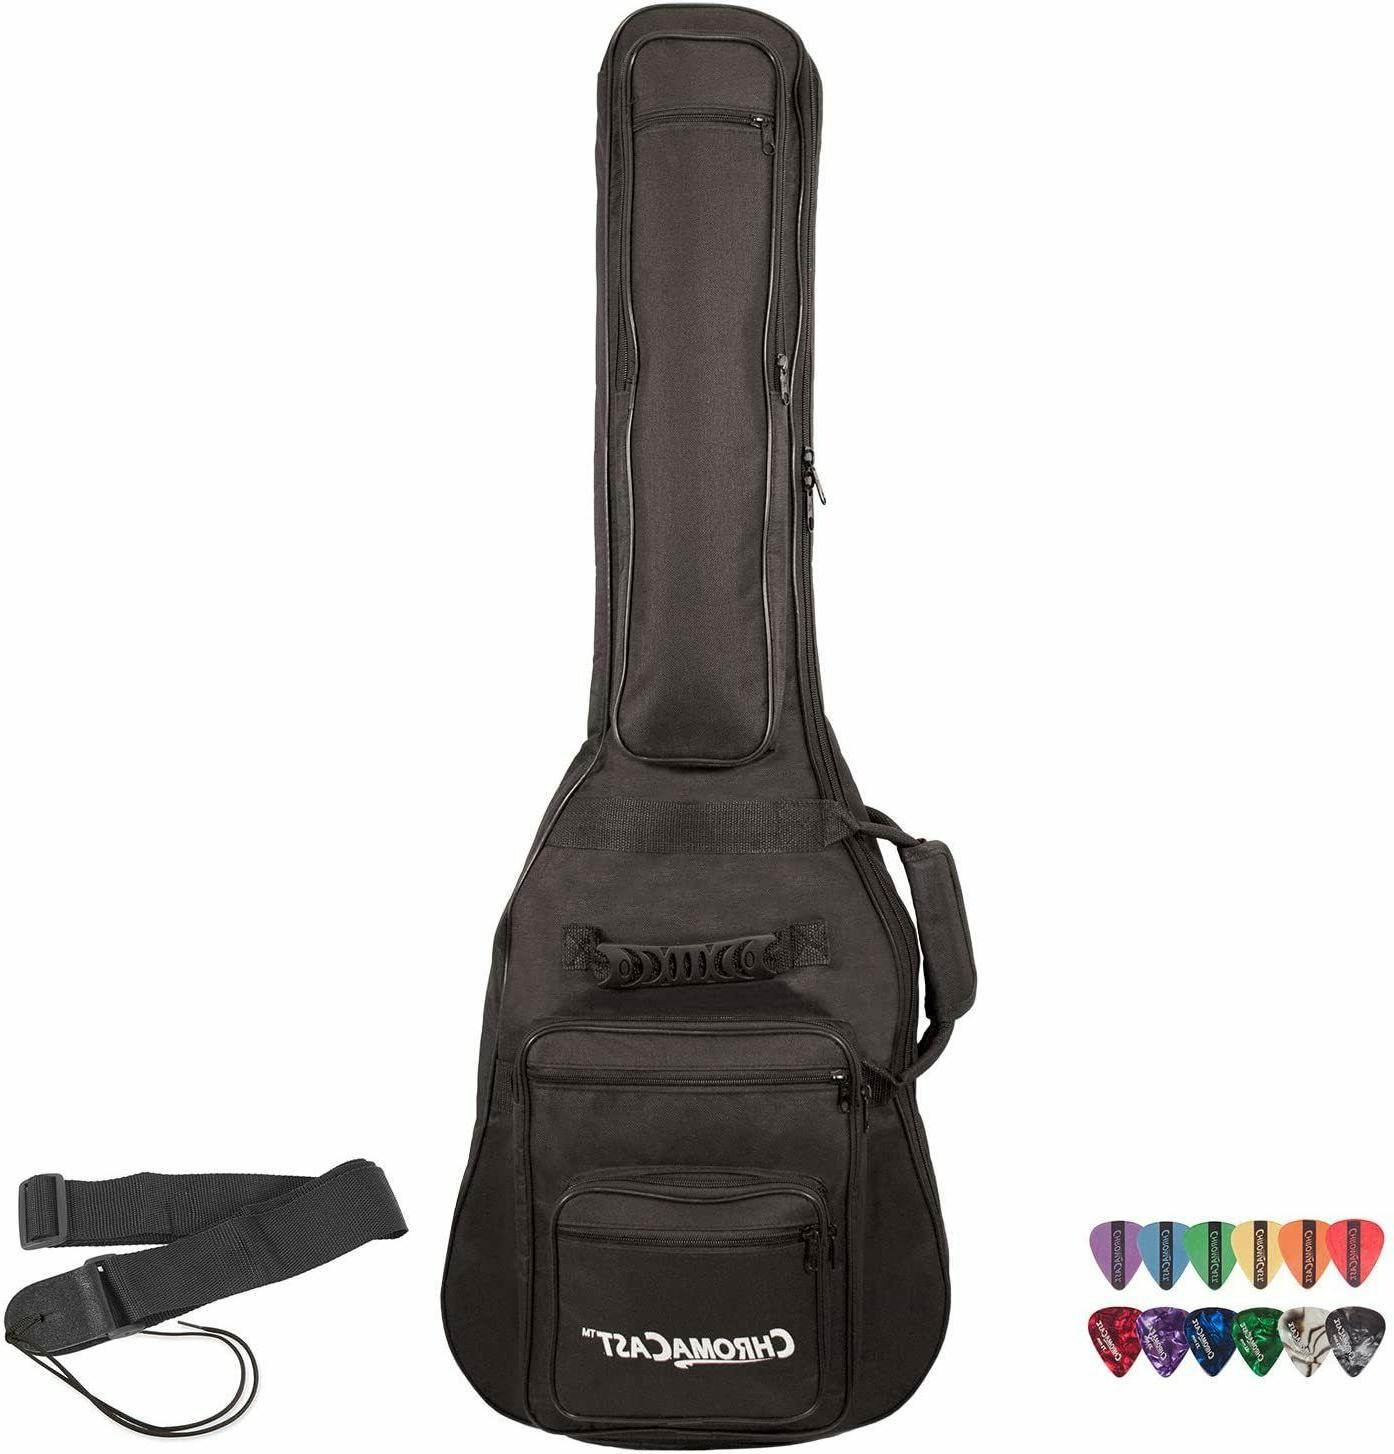 GO-DPS ChromaCast Electric Guitar 6-Pocket Padded Gig Bag wi